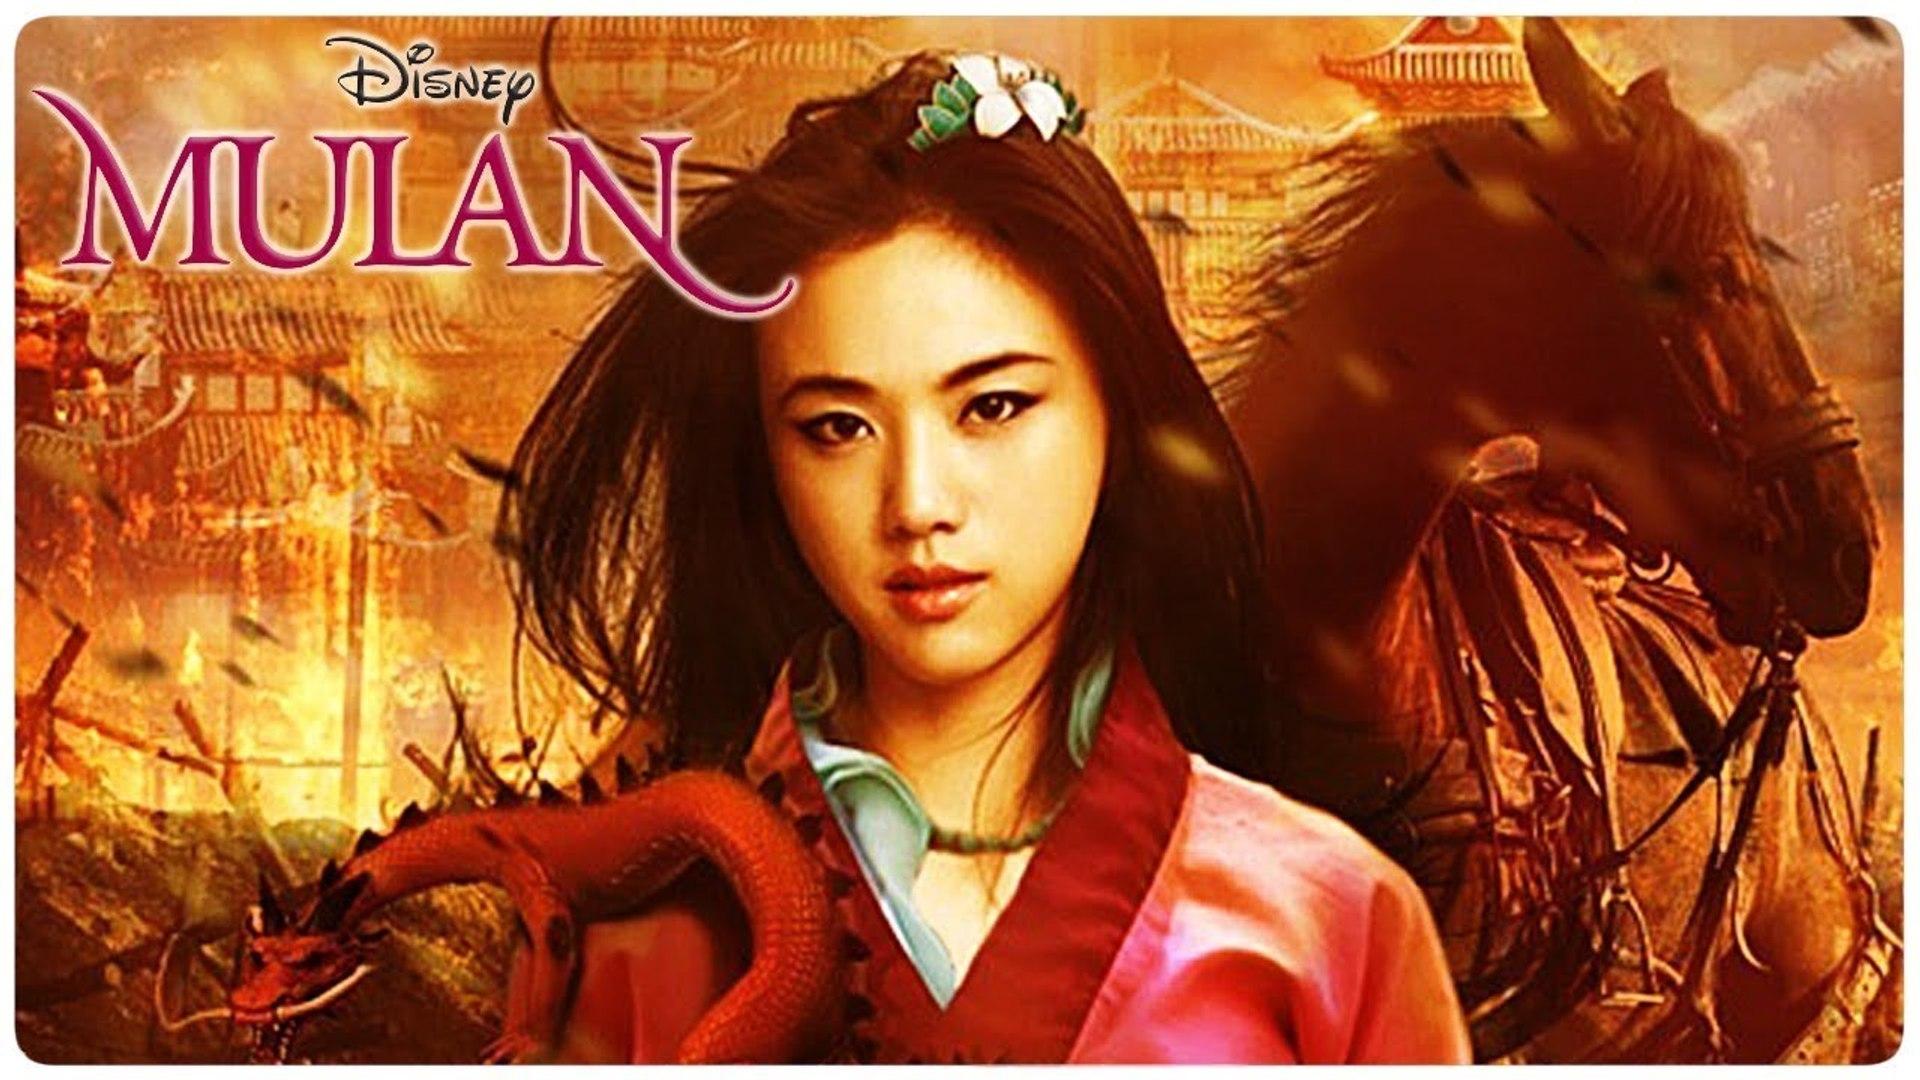 Download Mulan 2020 Wallpaper Cikimmcom 1920x1080